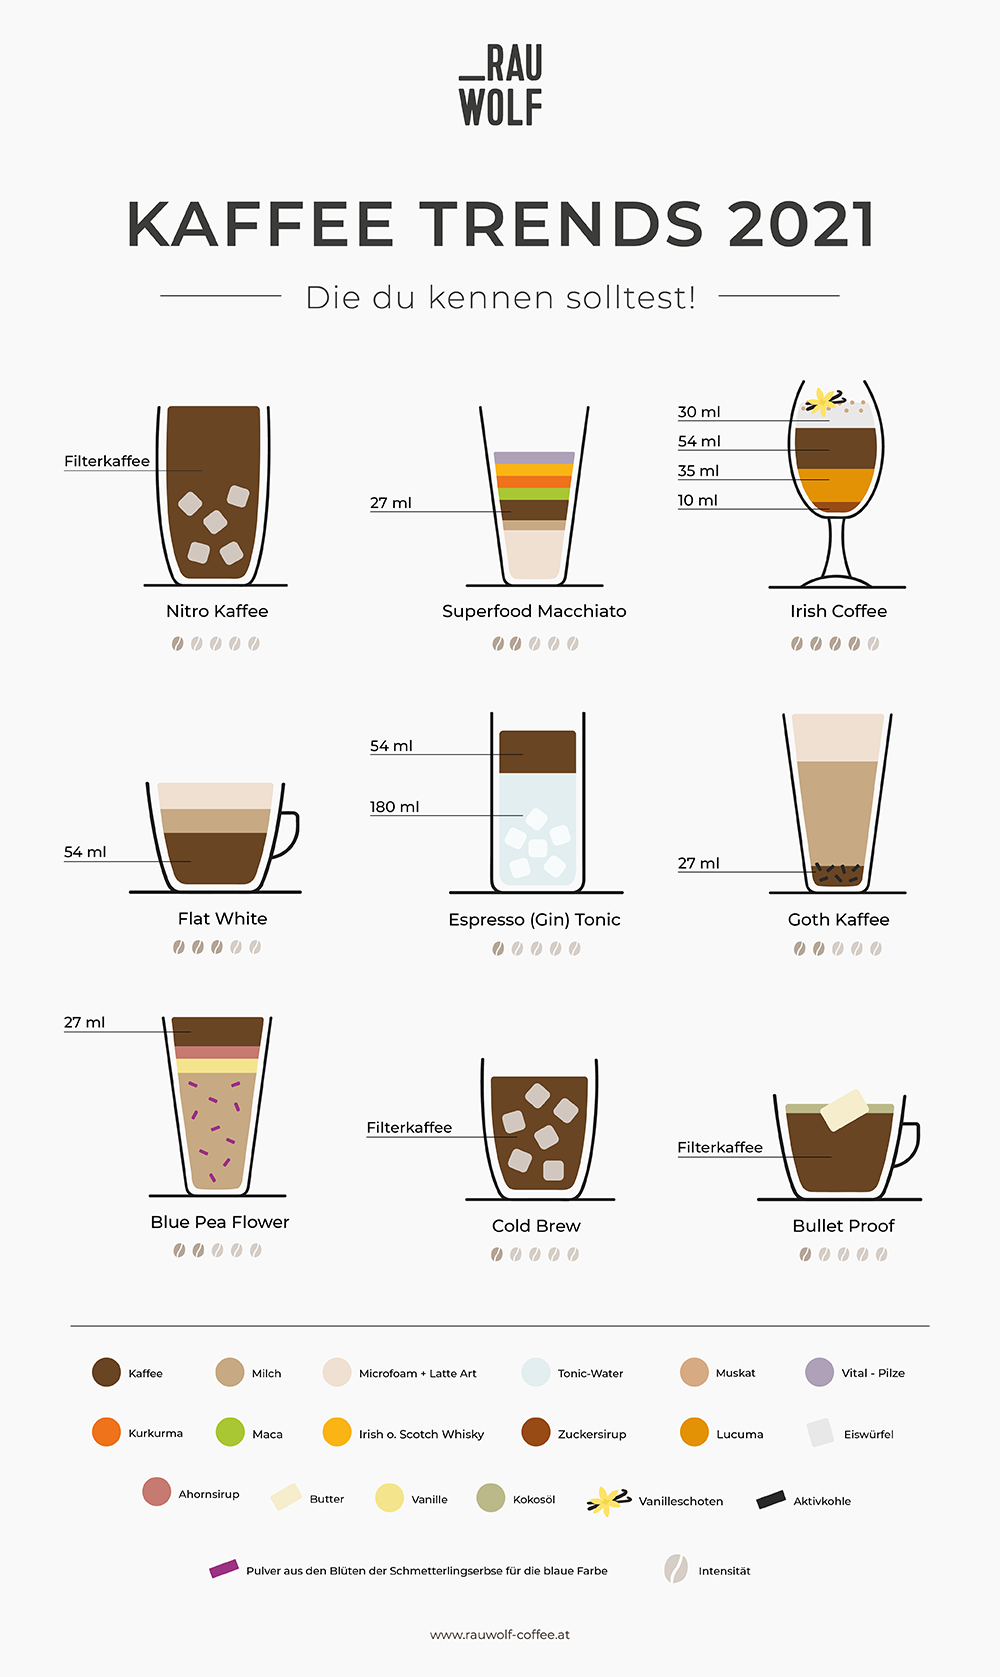 Kaffee Trends 2021